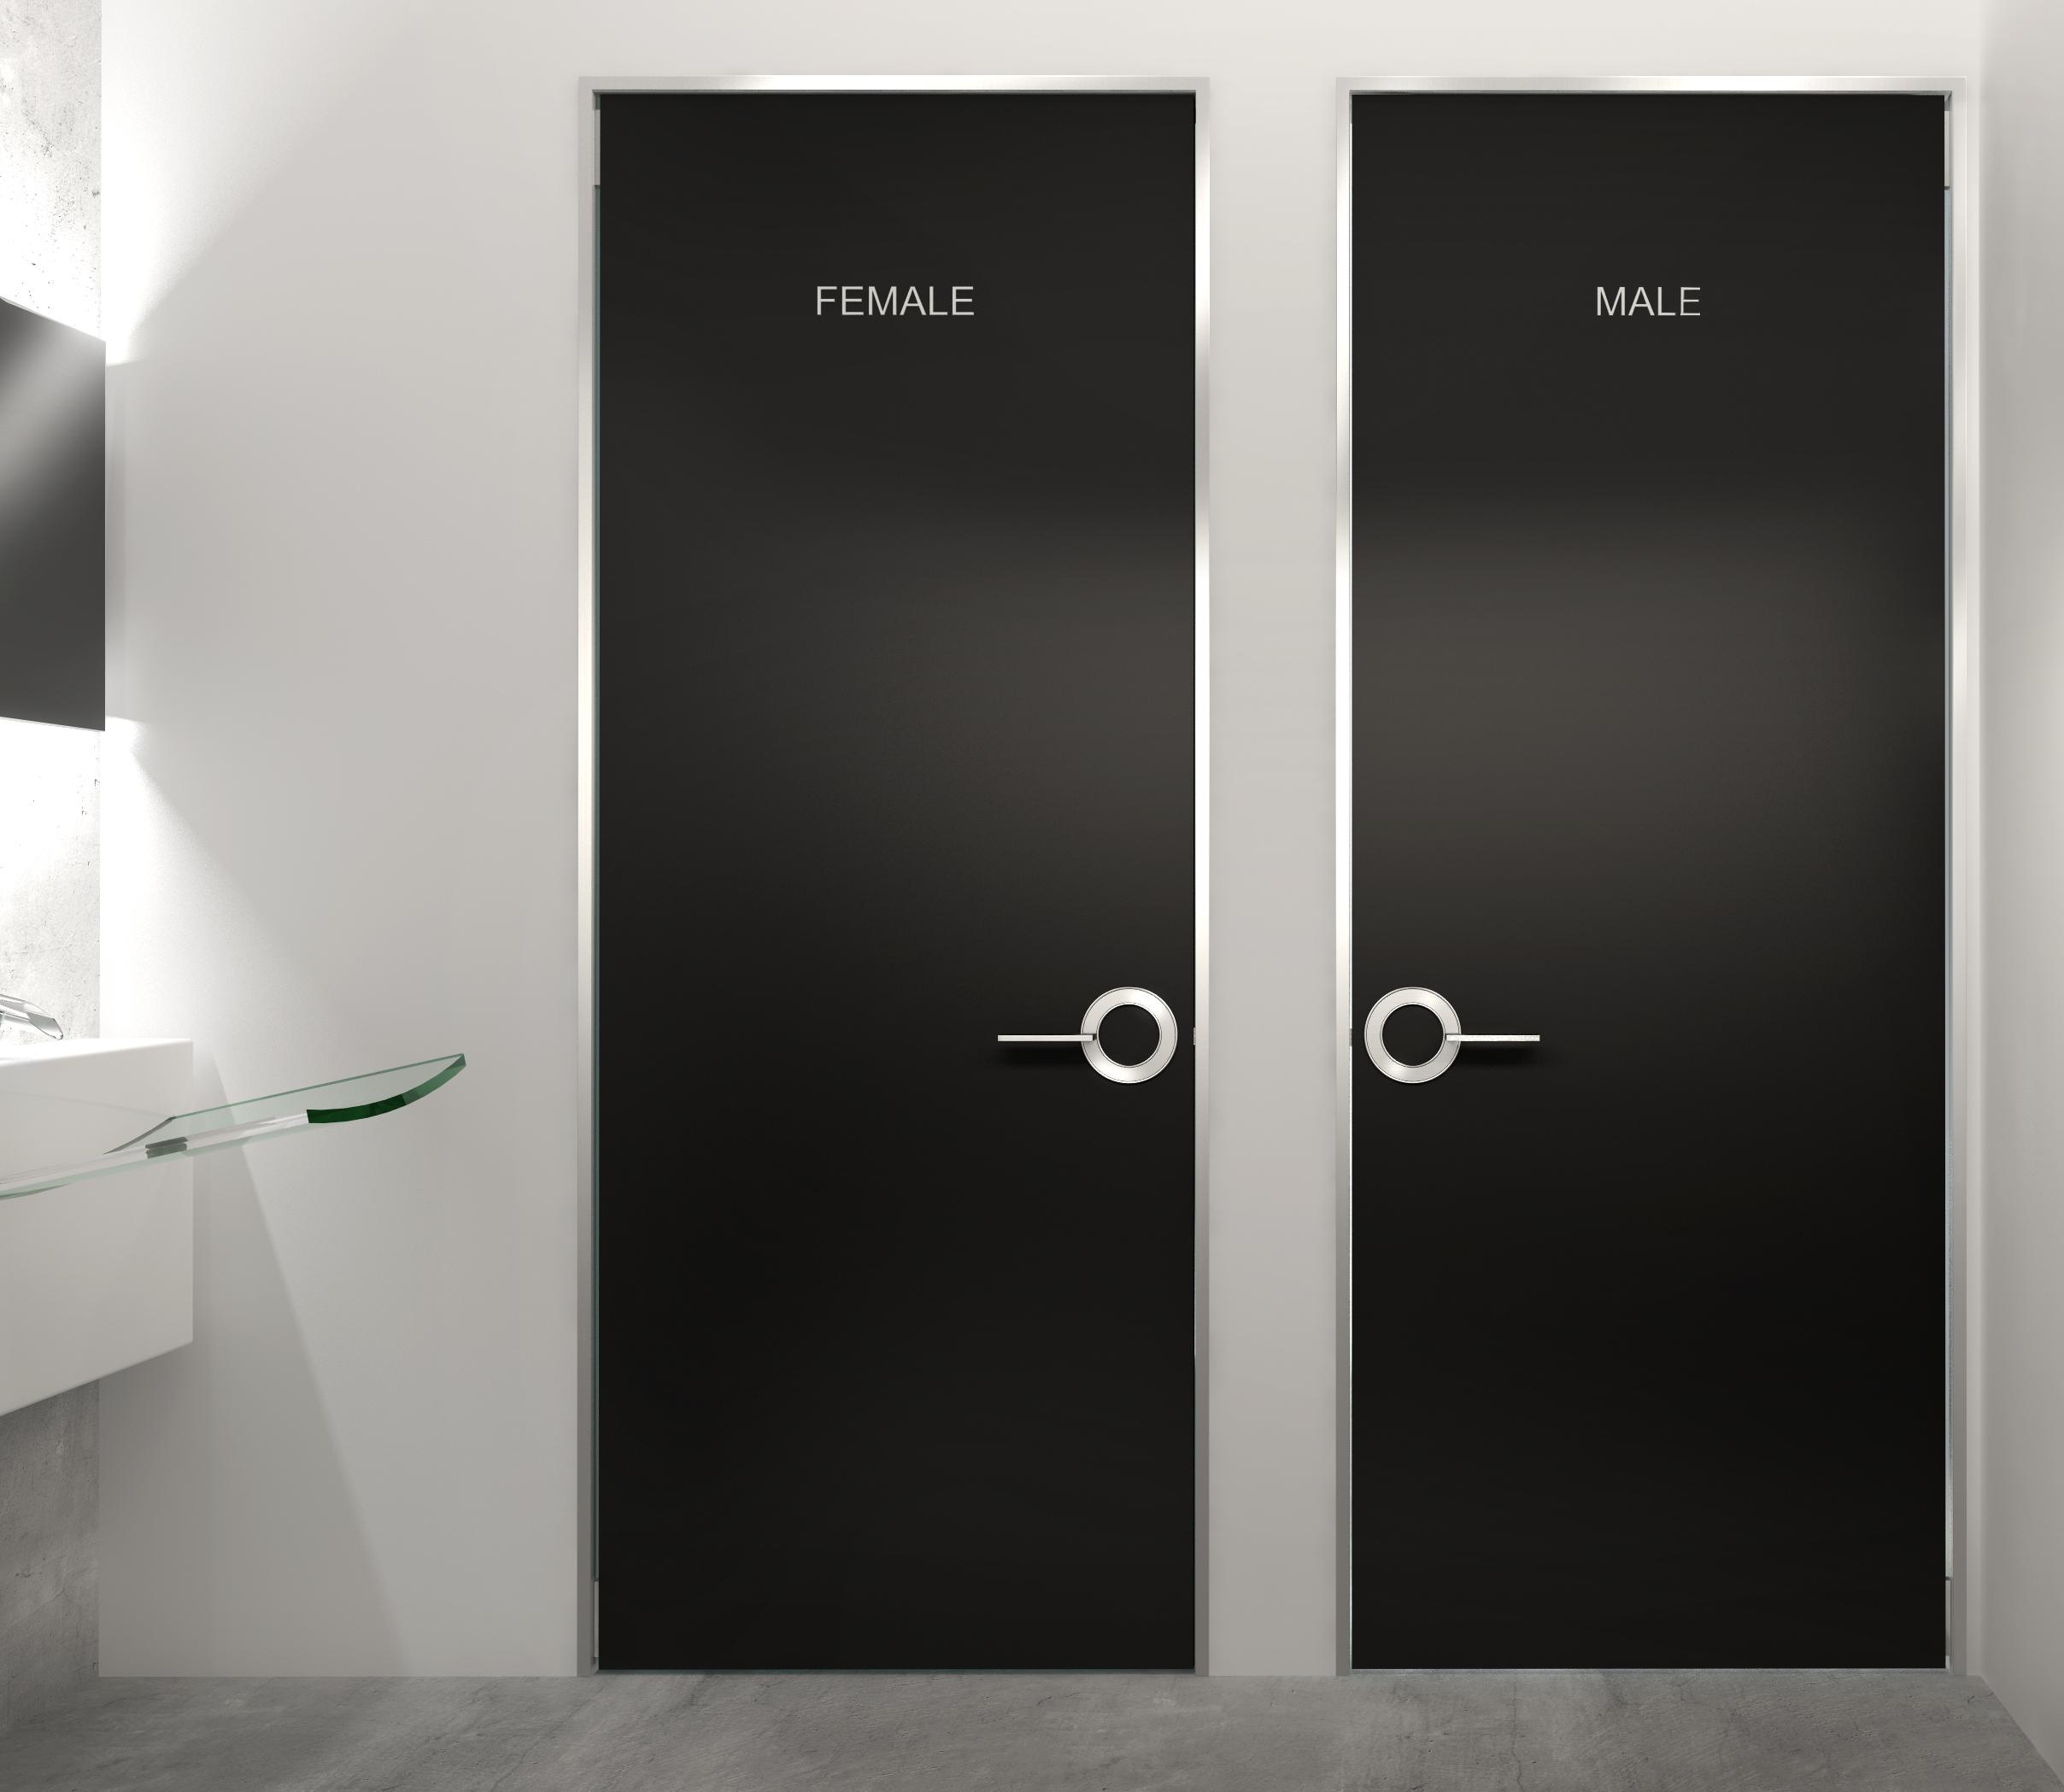 Orb Door Handle By Michael Samoriz At Coroflot Com